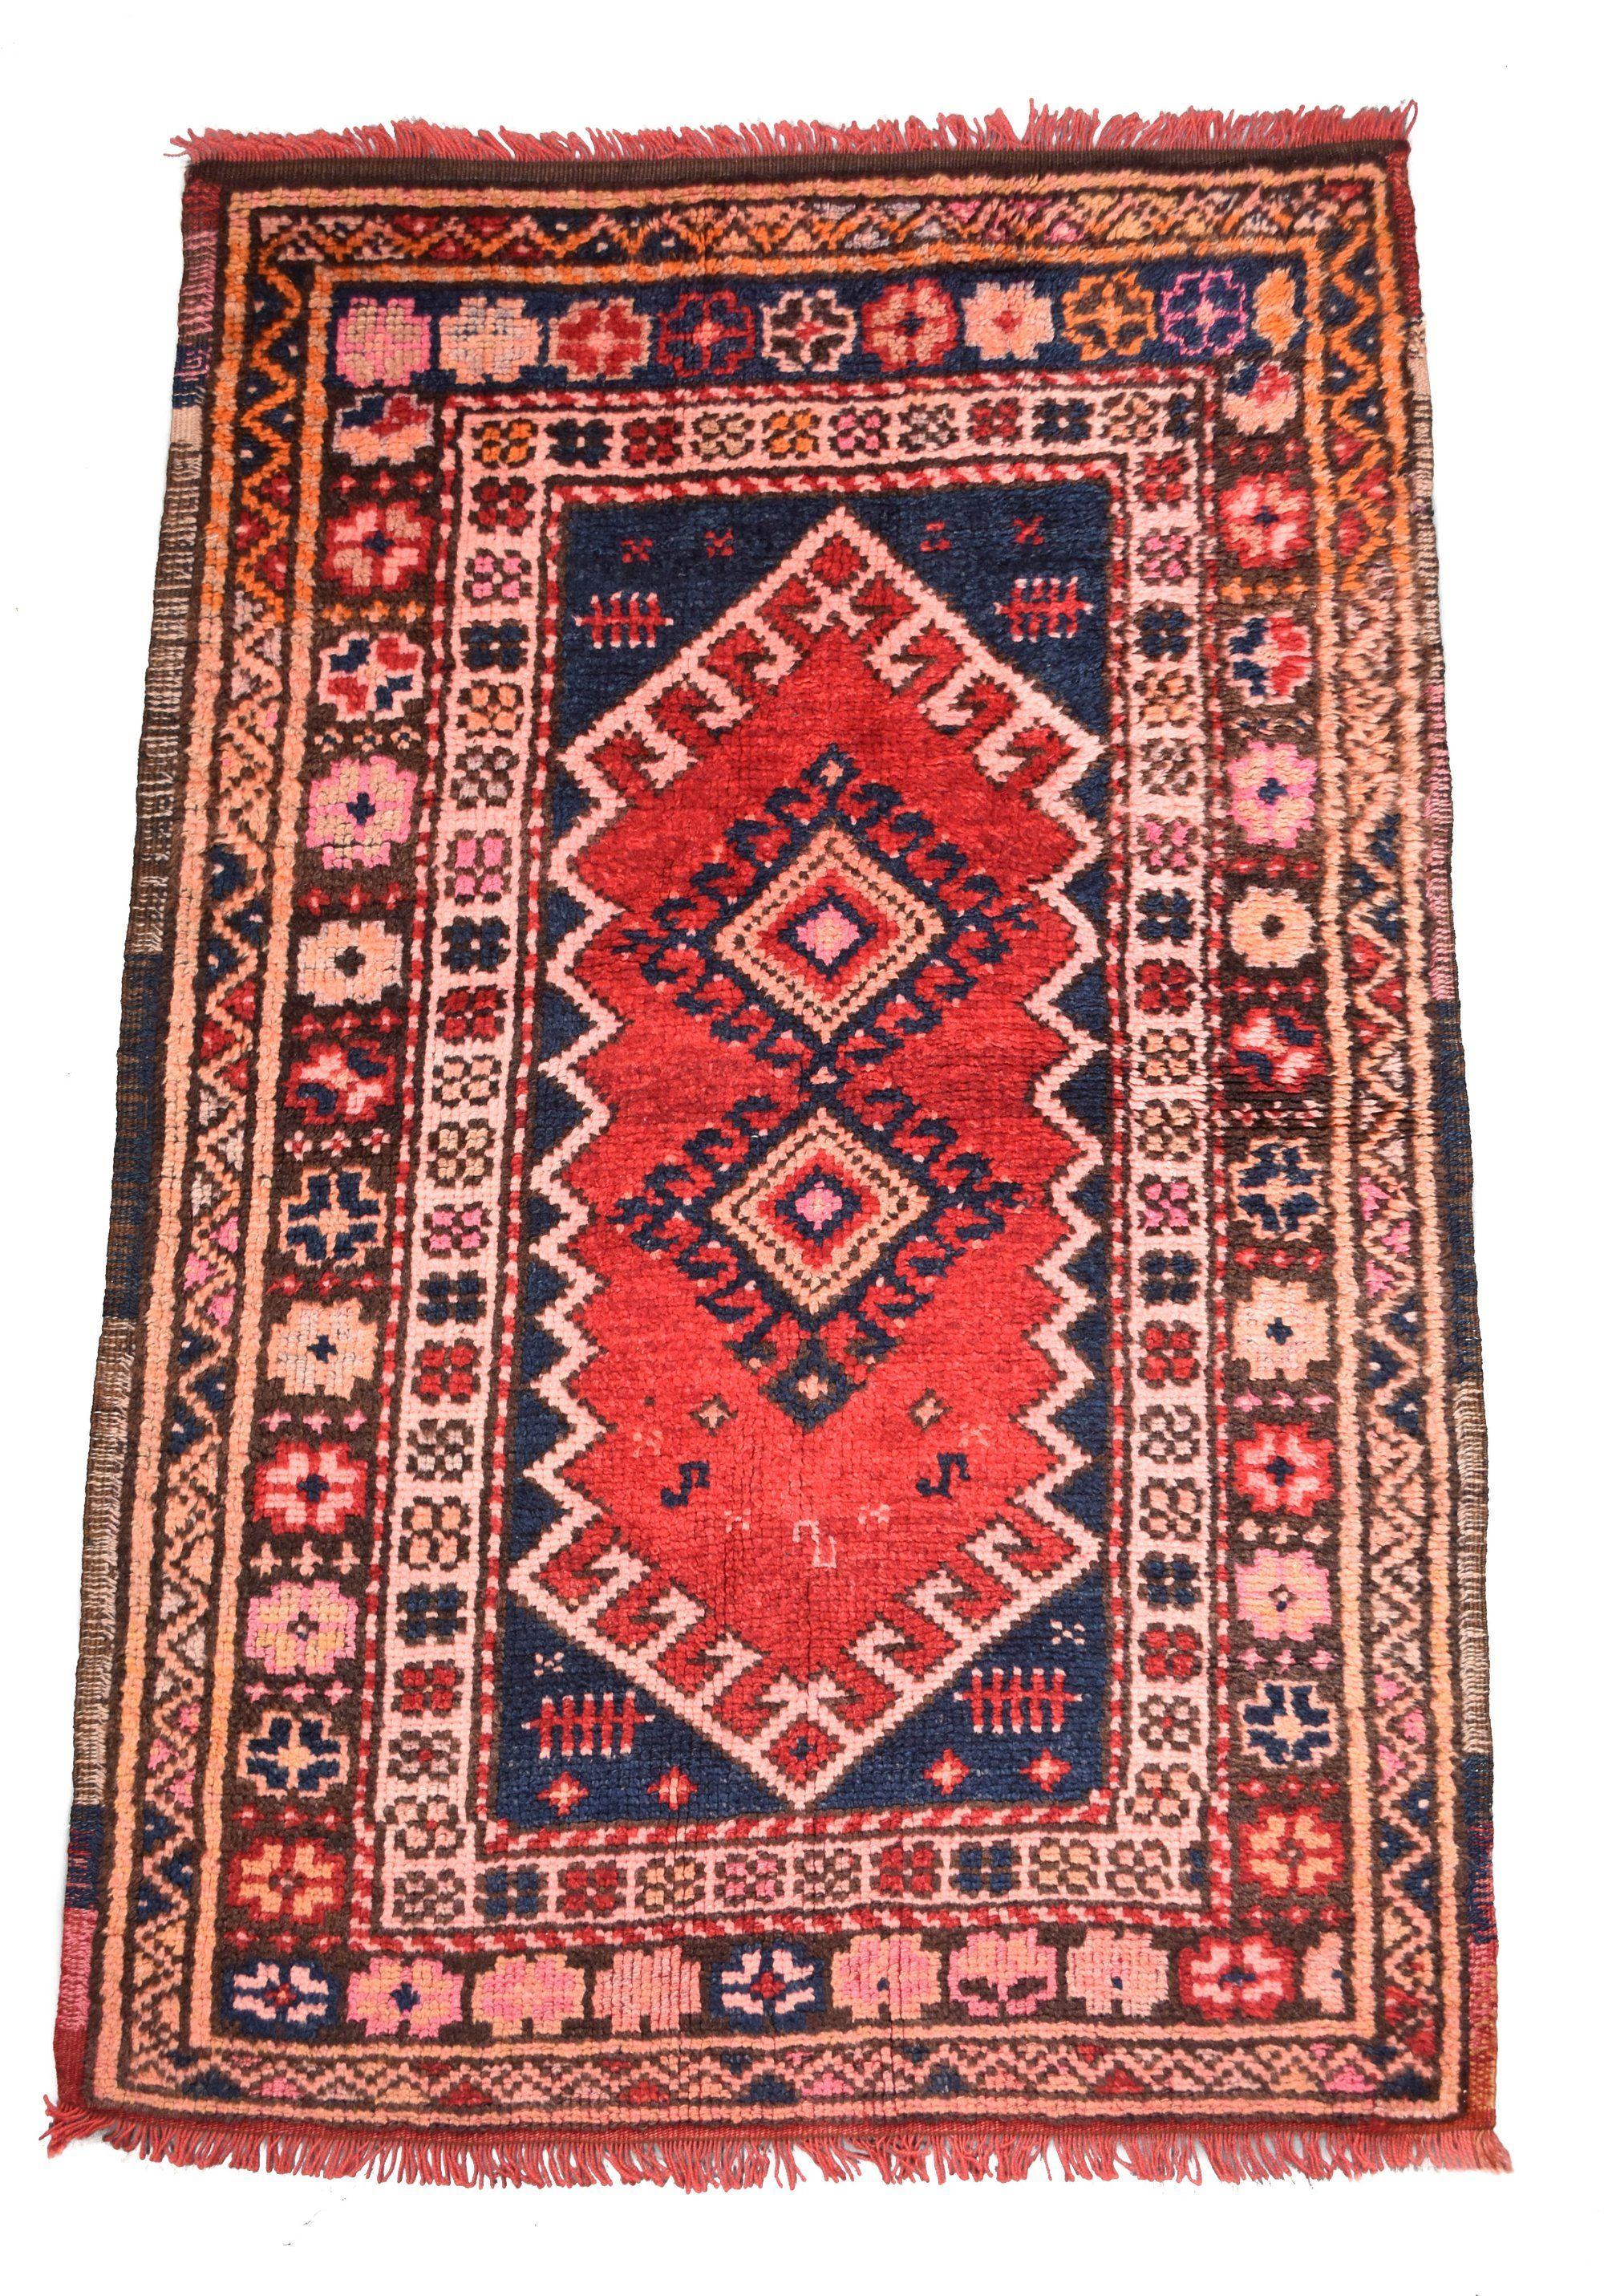 Antique Qashqai 2 9 X 4 3 Rug Weave Antiques Woven Rug